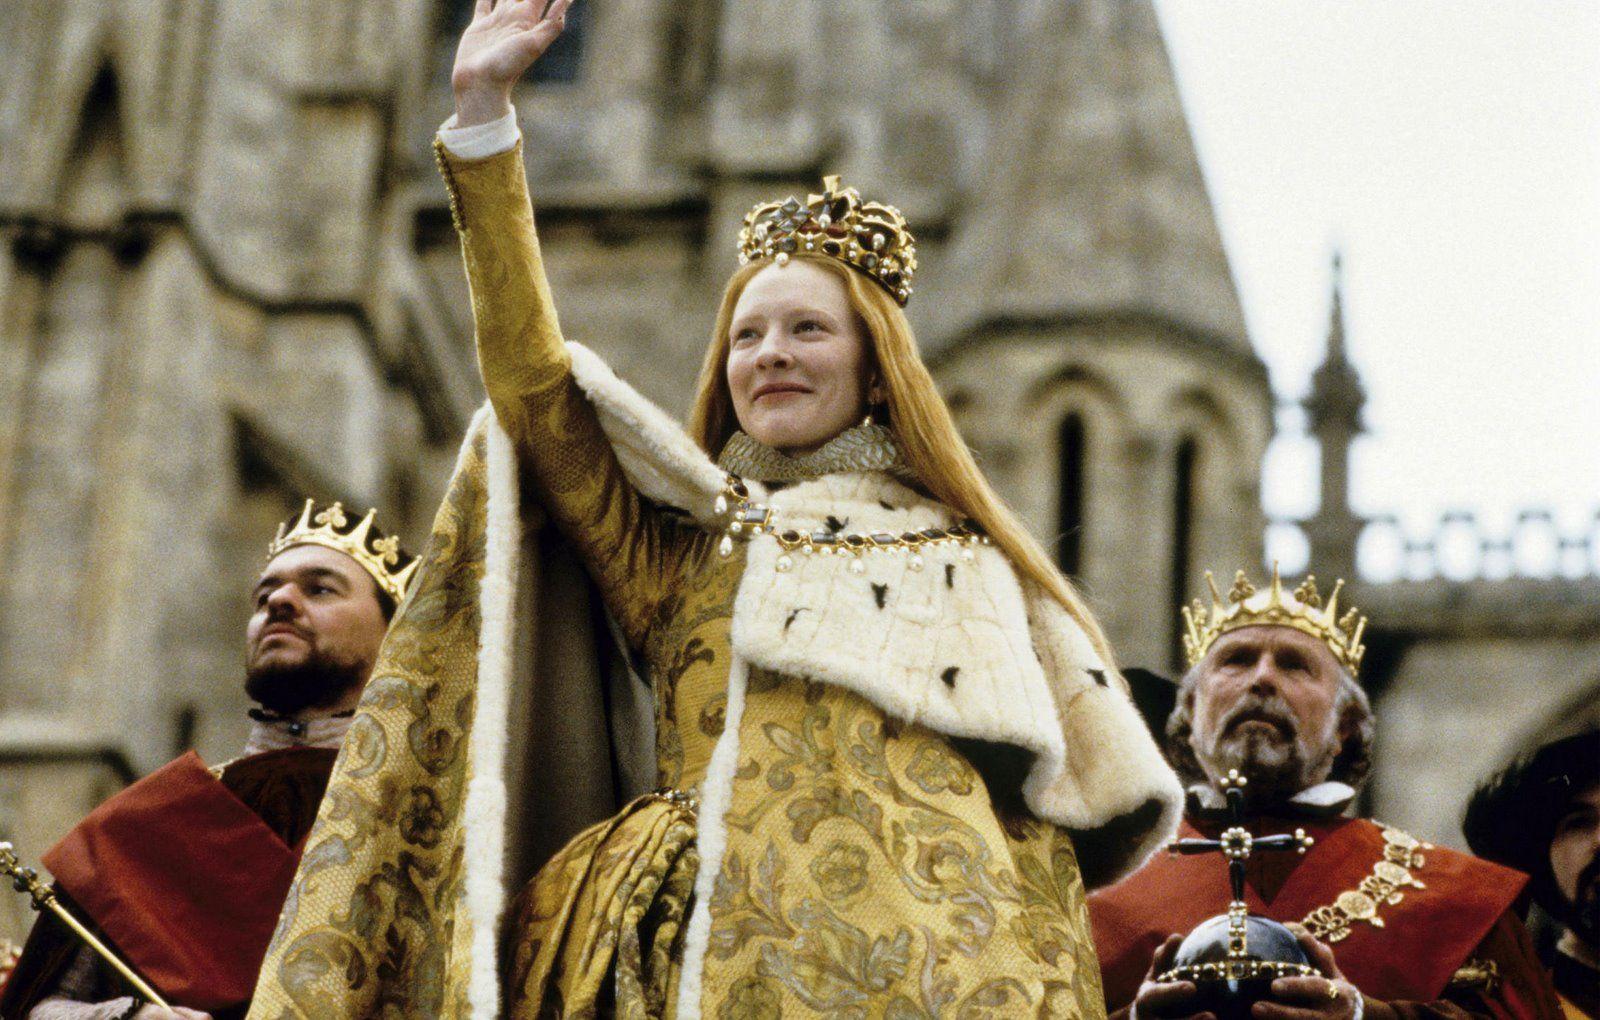 Queen Elizabeth I (Cate Blanchett) 'Elizabeth' 1998. The